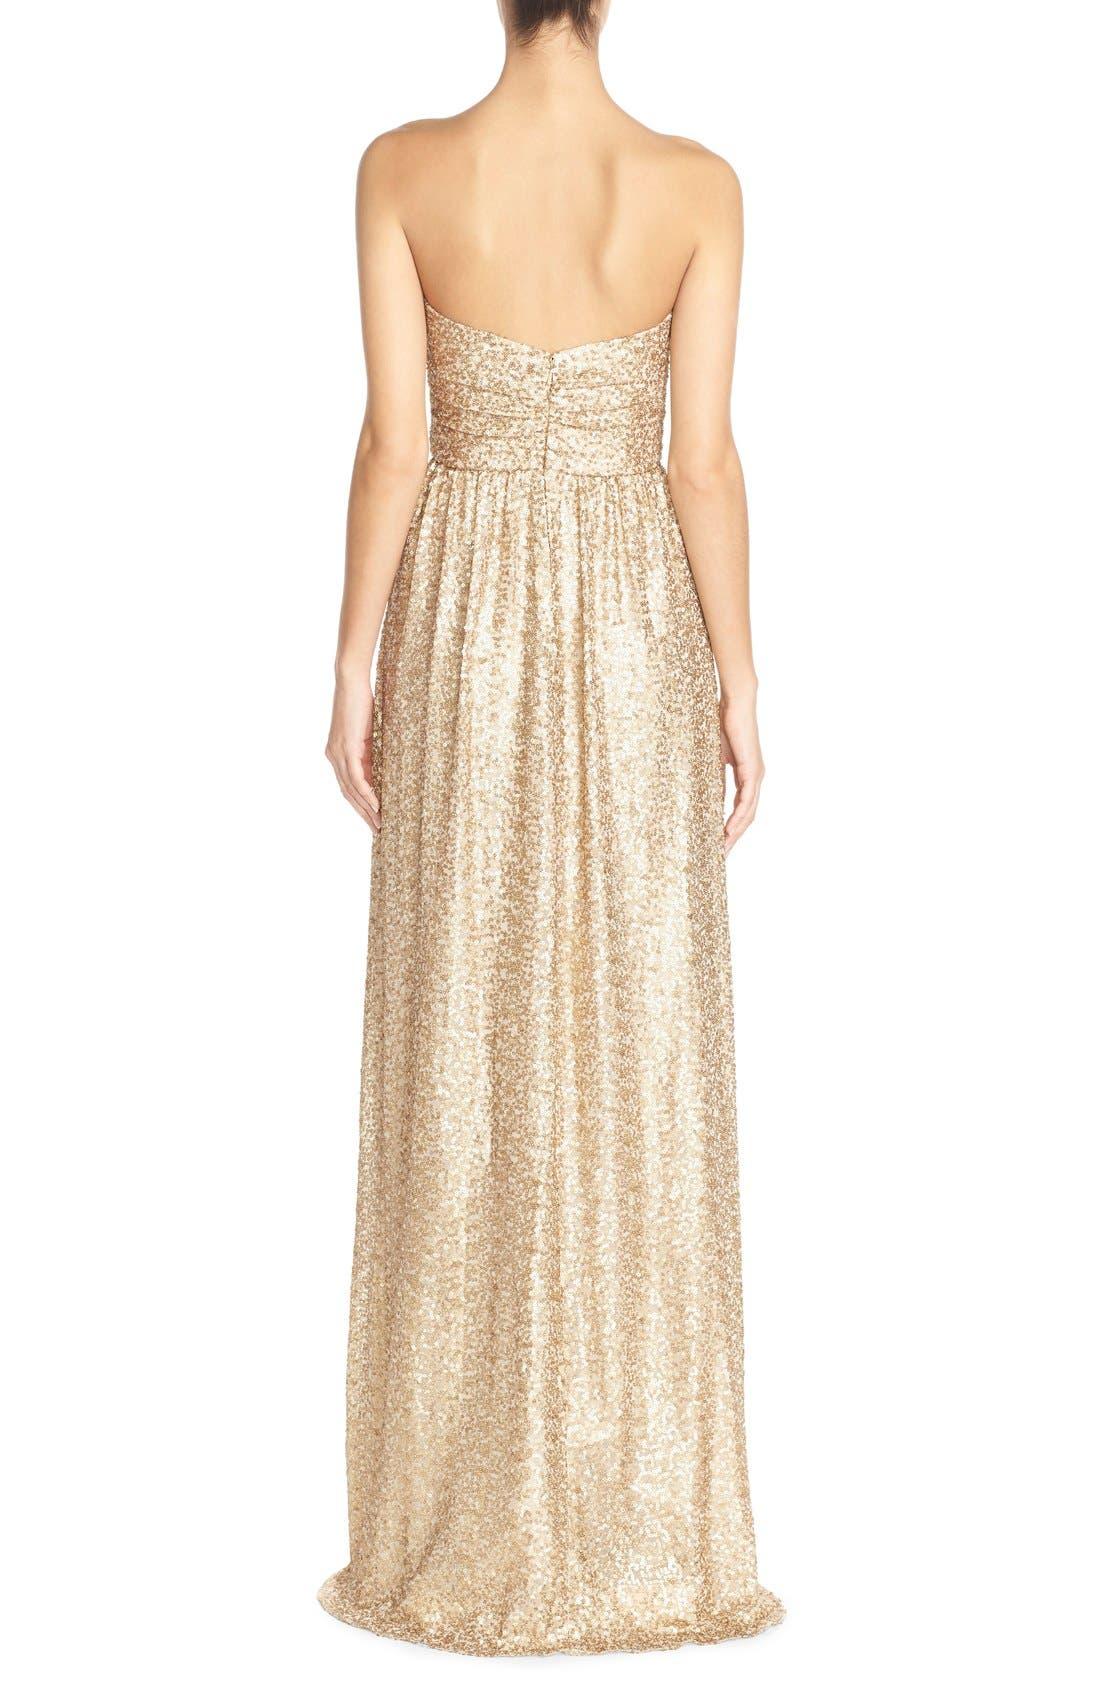 'London' Sequin Tulle Strapless Column Gown,                             Alternate thumbnail 4, color,                             710